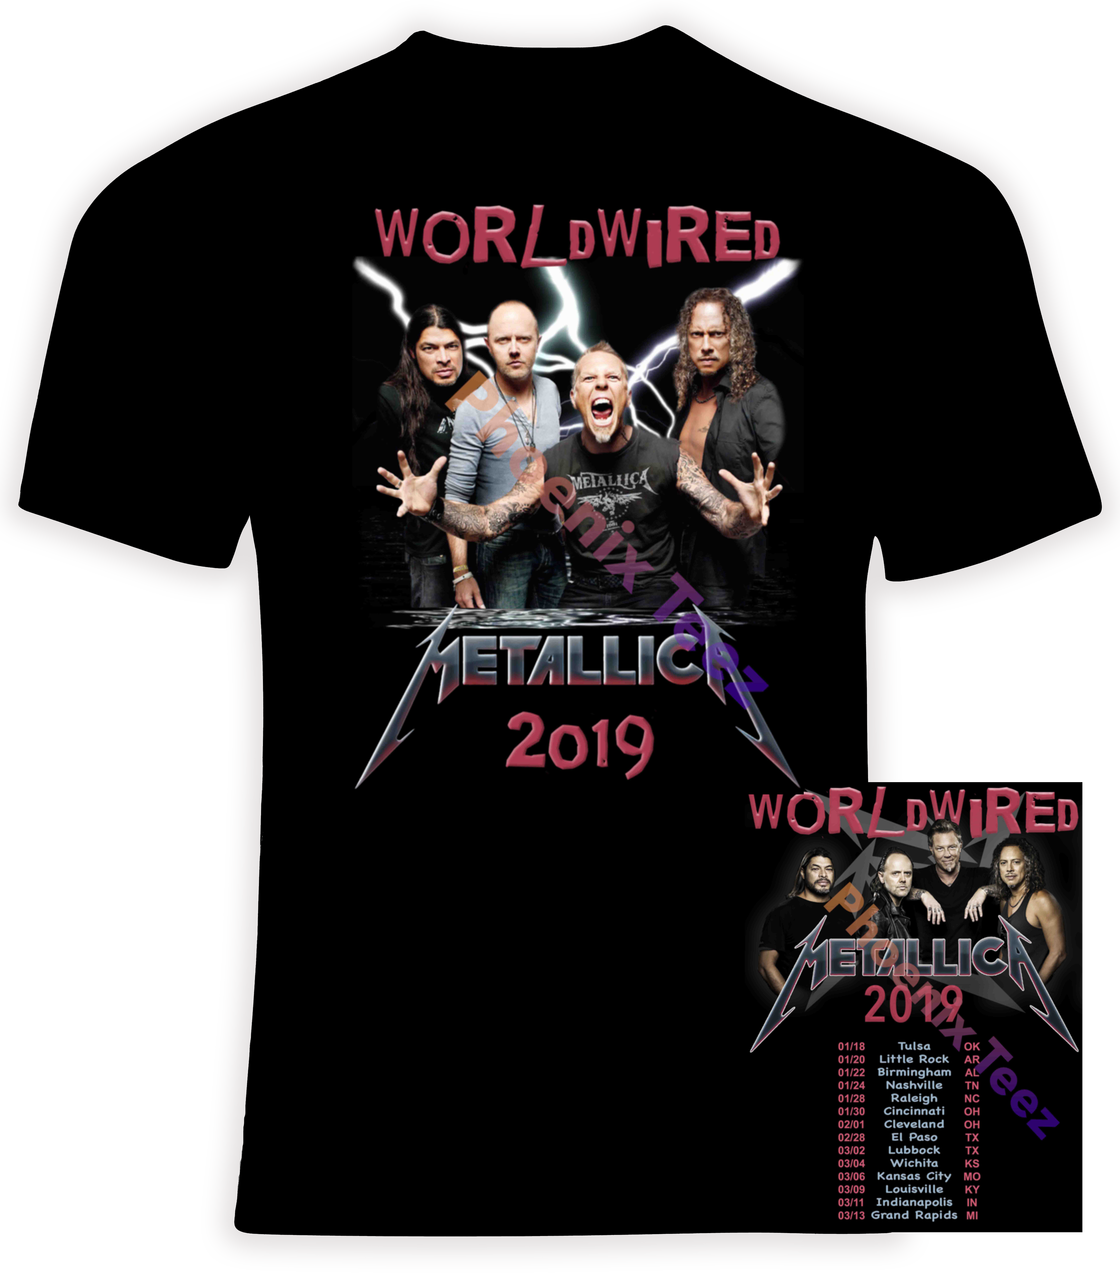 Metallica 2019 Worldwired Concert Tour - Phoenix Tees